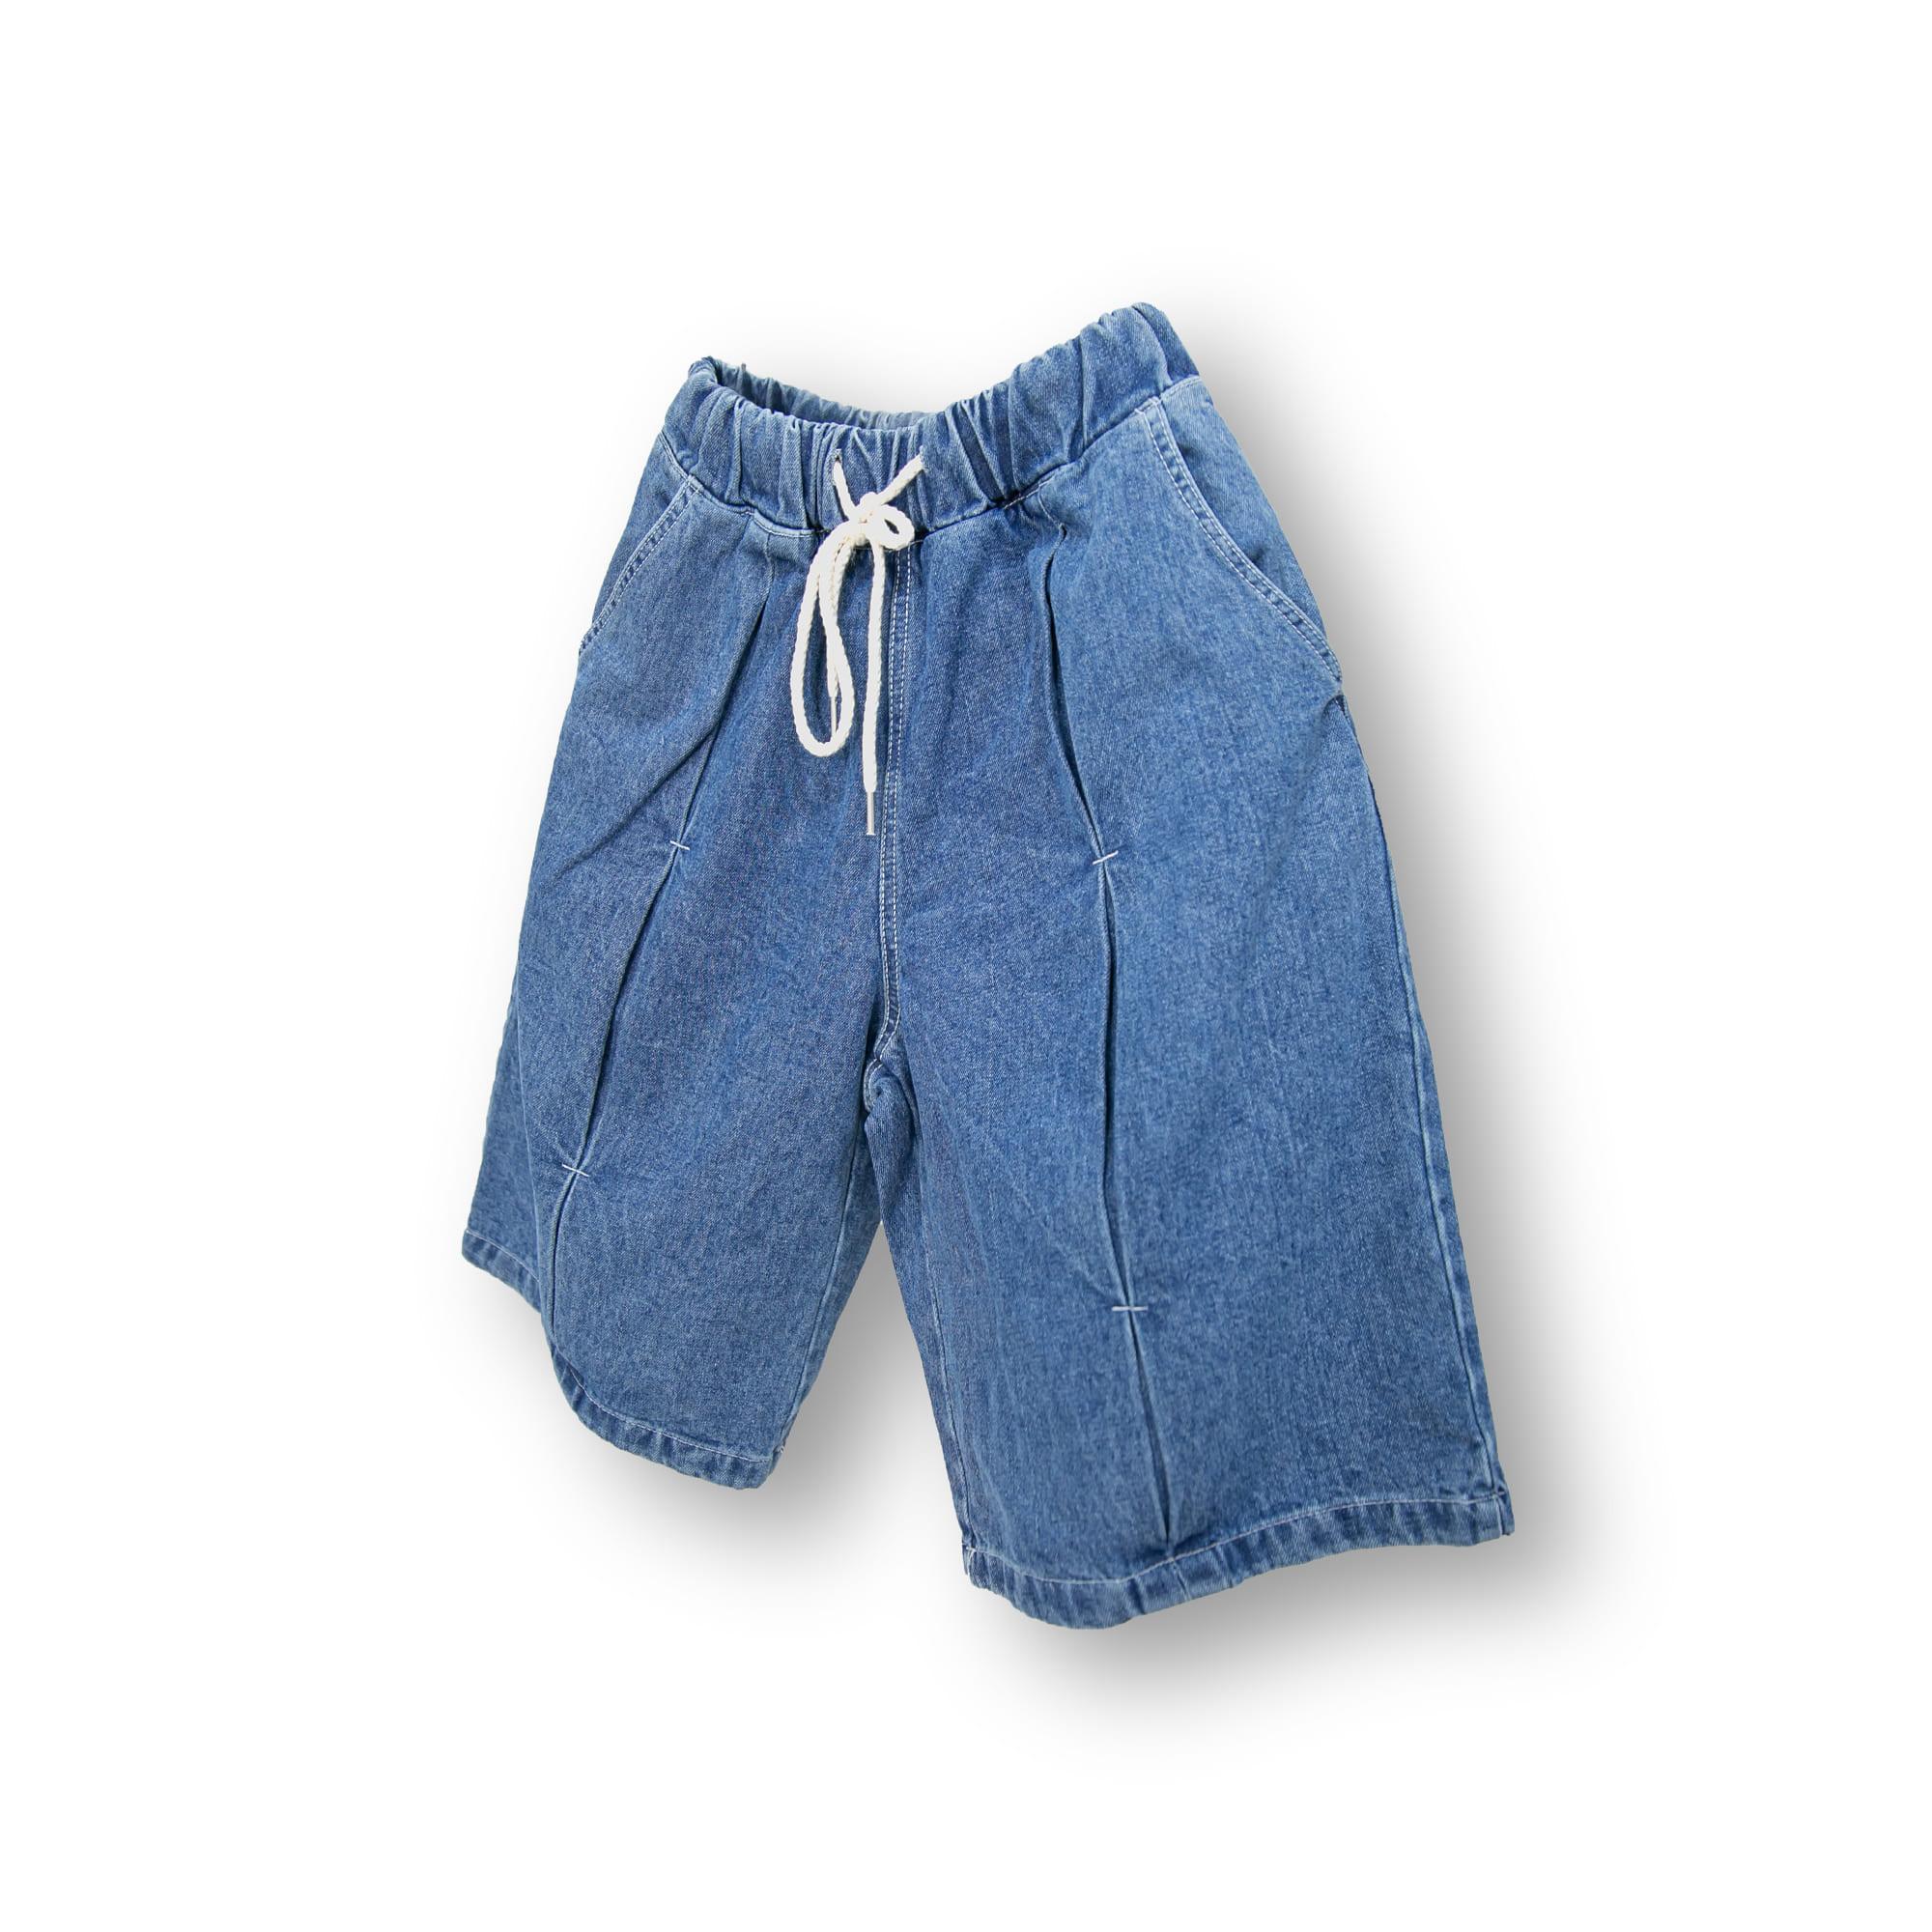 Butterfly Denim Half Pants - Blue